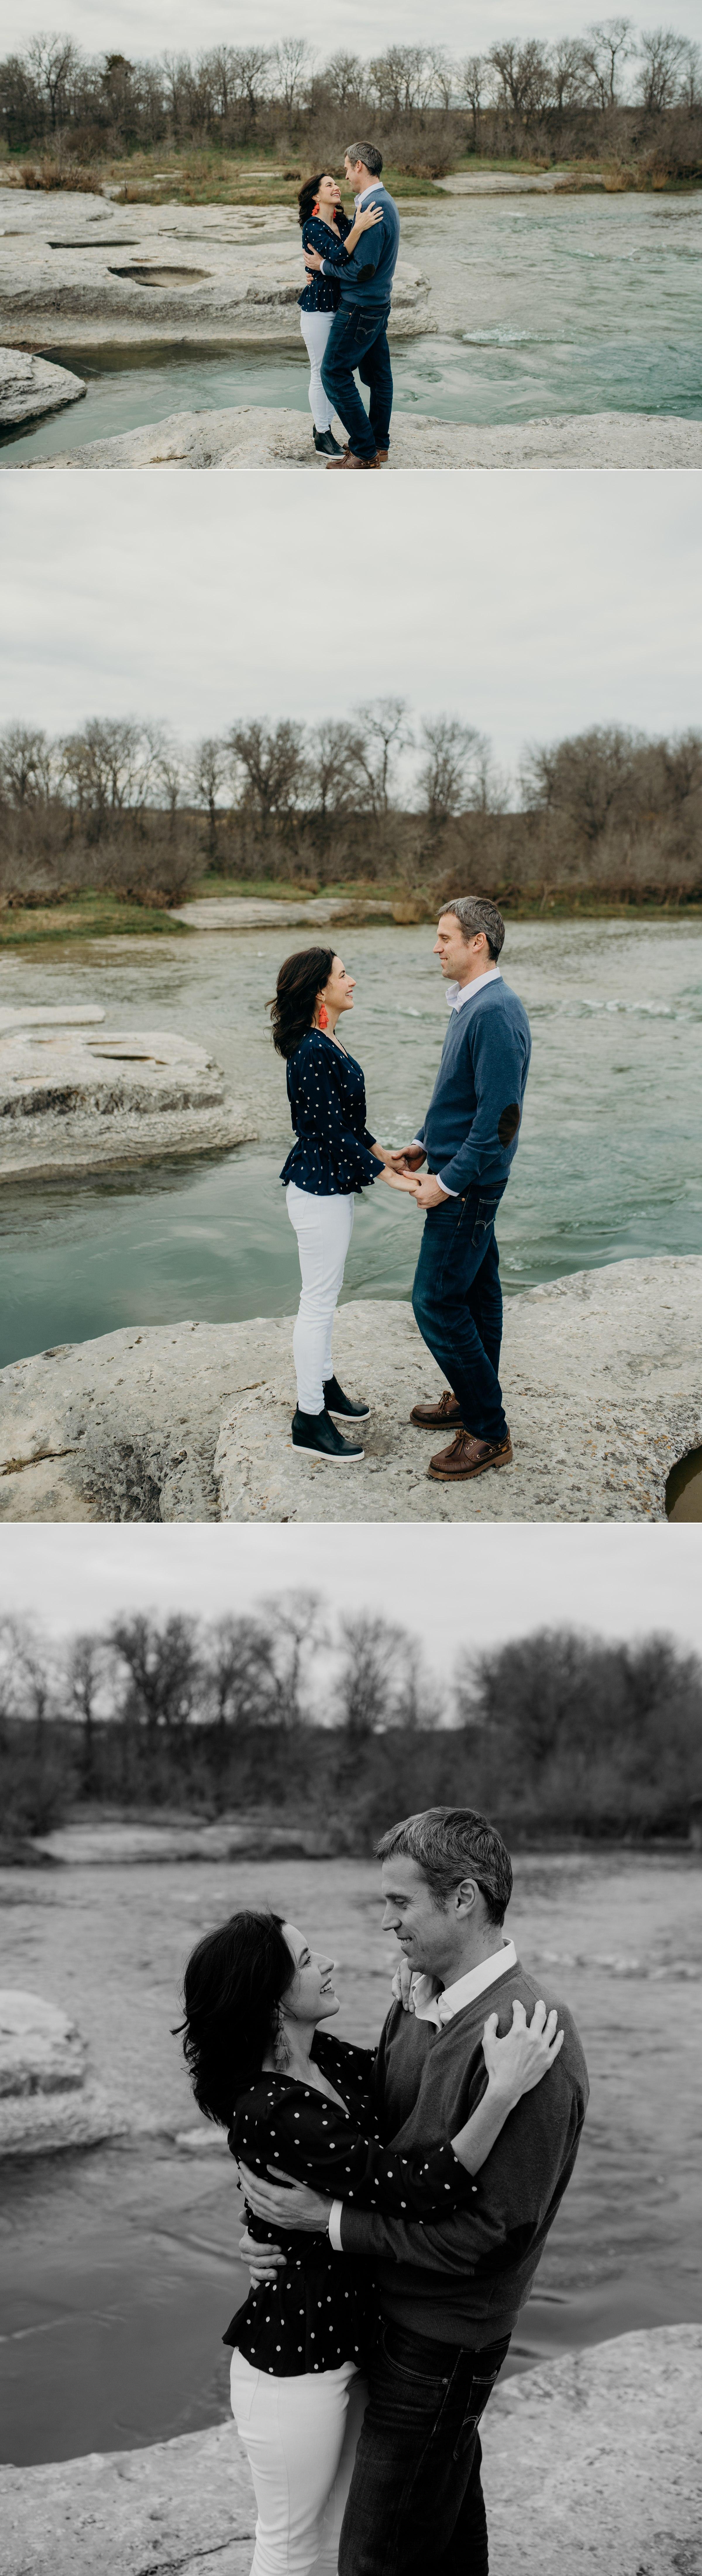 austin-mckinney-falls-engagement-photographer-elopement-prices-best-headshot-senior-adventurous-italy-minneapolis-texas-minnesota-dallas-houston-tulum-mexico_0010.jpg